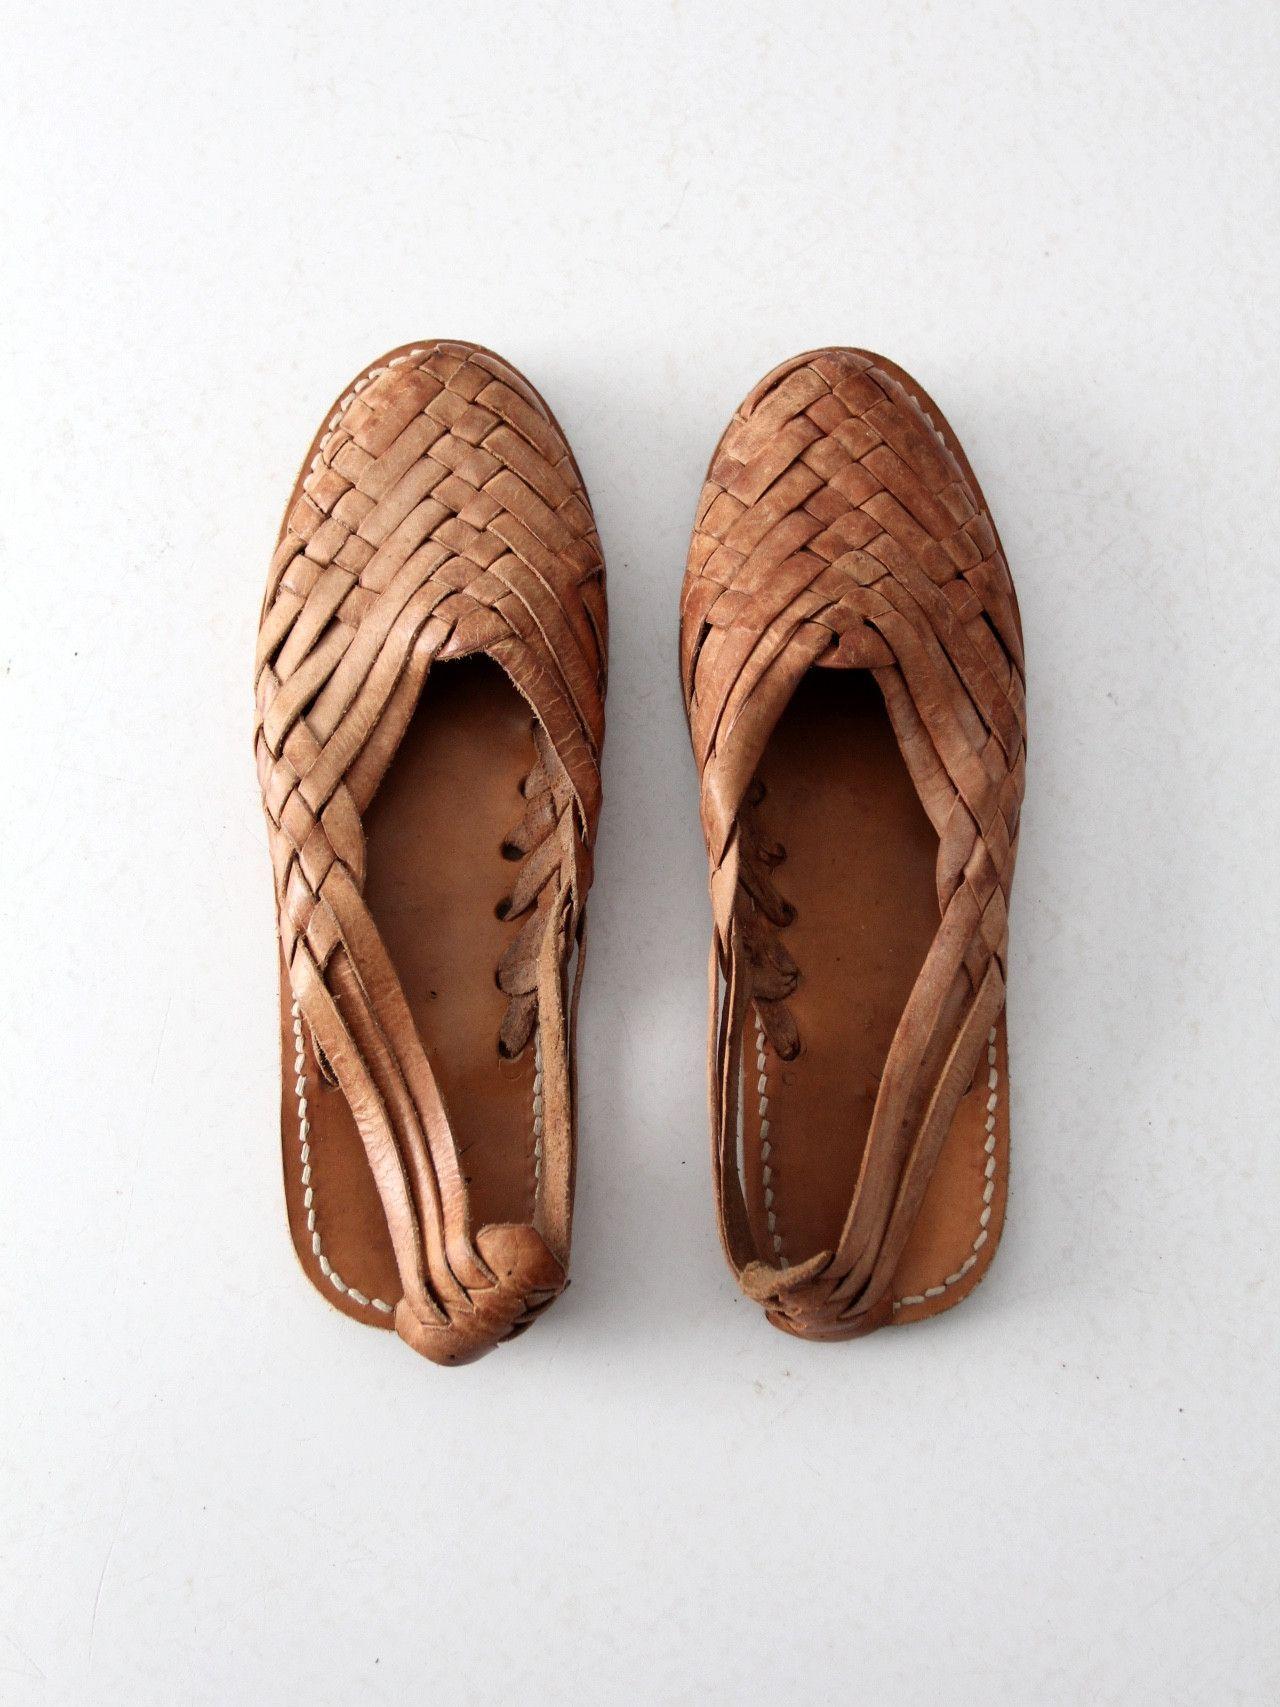 60f361f83daf Vintage huaraches sandals